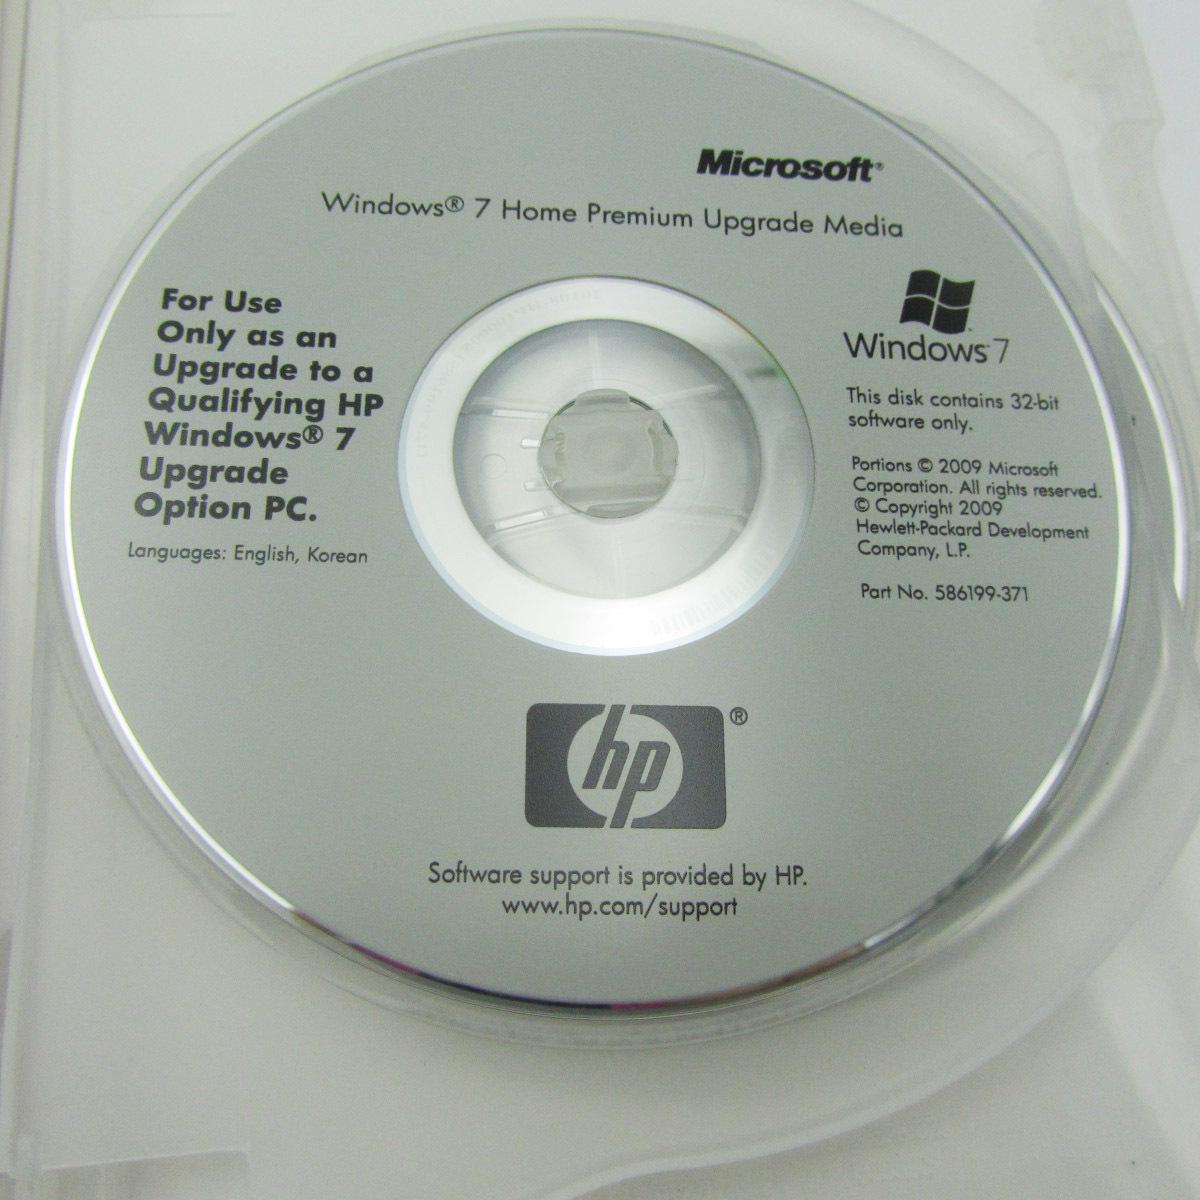 RS264●Windows 7 hp アップグレード用 vista から Windows 7 homepremium/ライセンスキー付き/英語 韓国語版_画像4